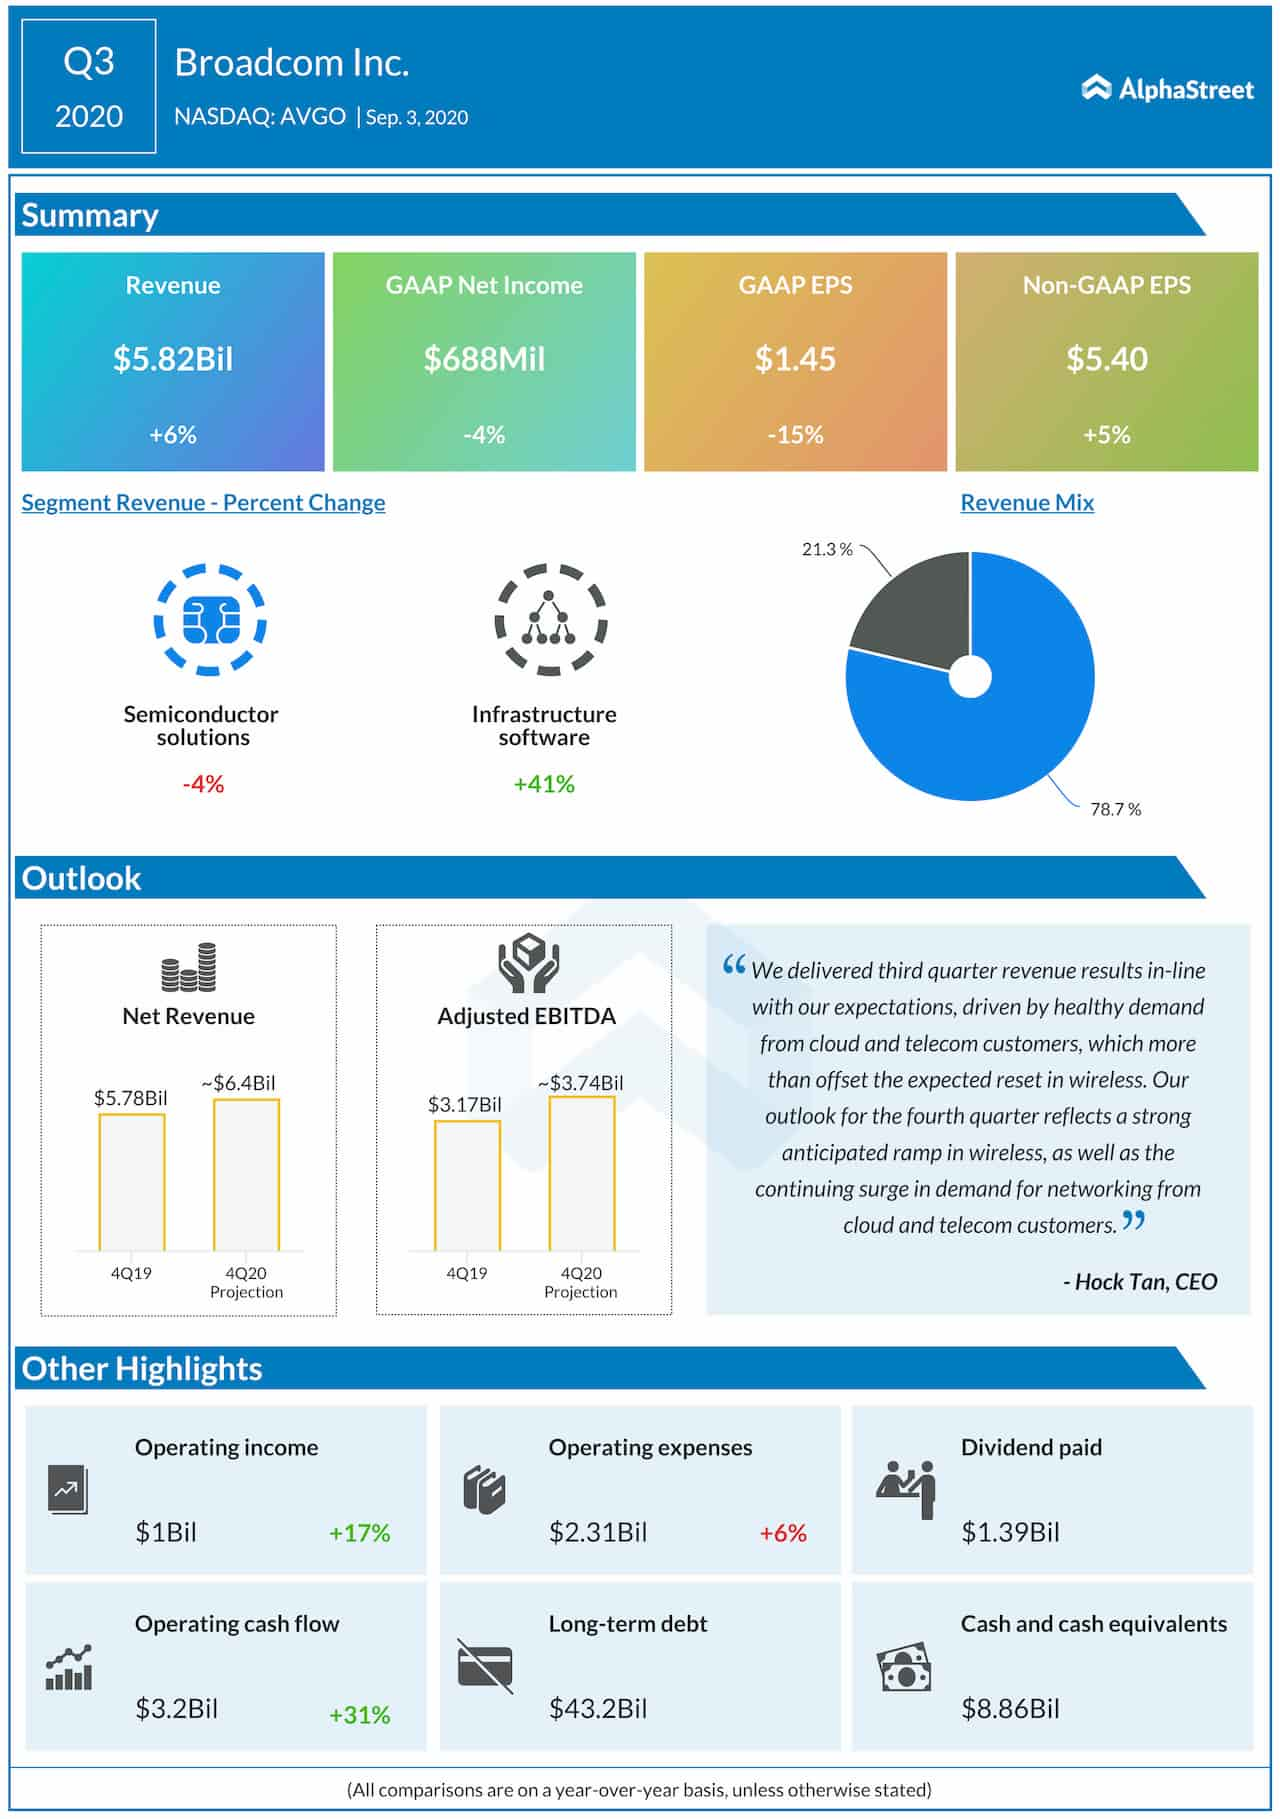 Broadcom Q3 2020 Earnings Infographic